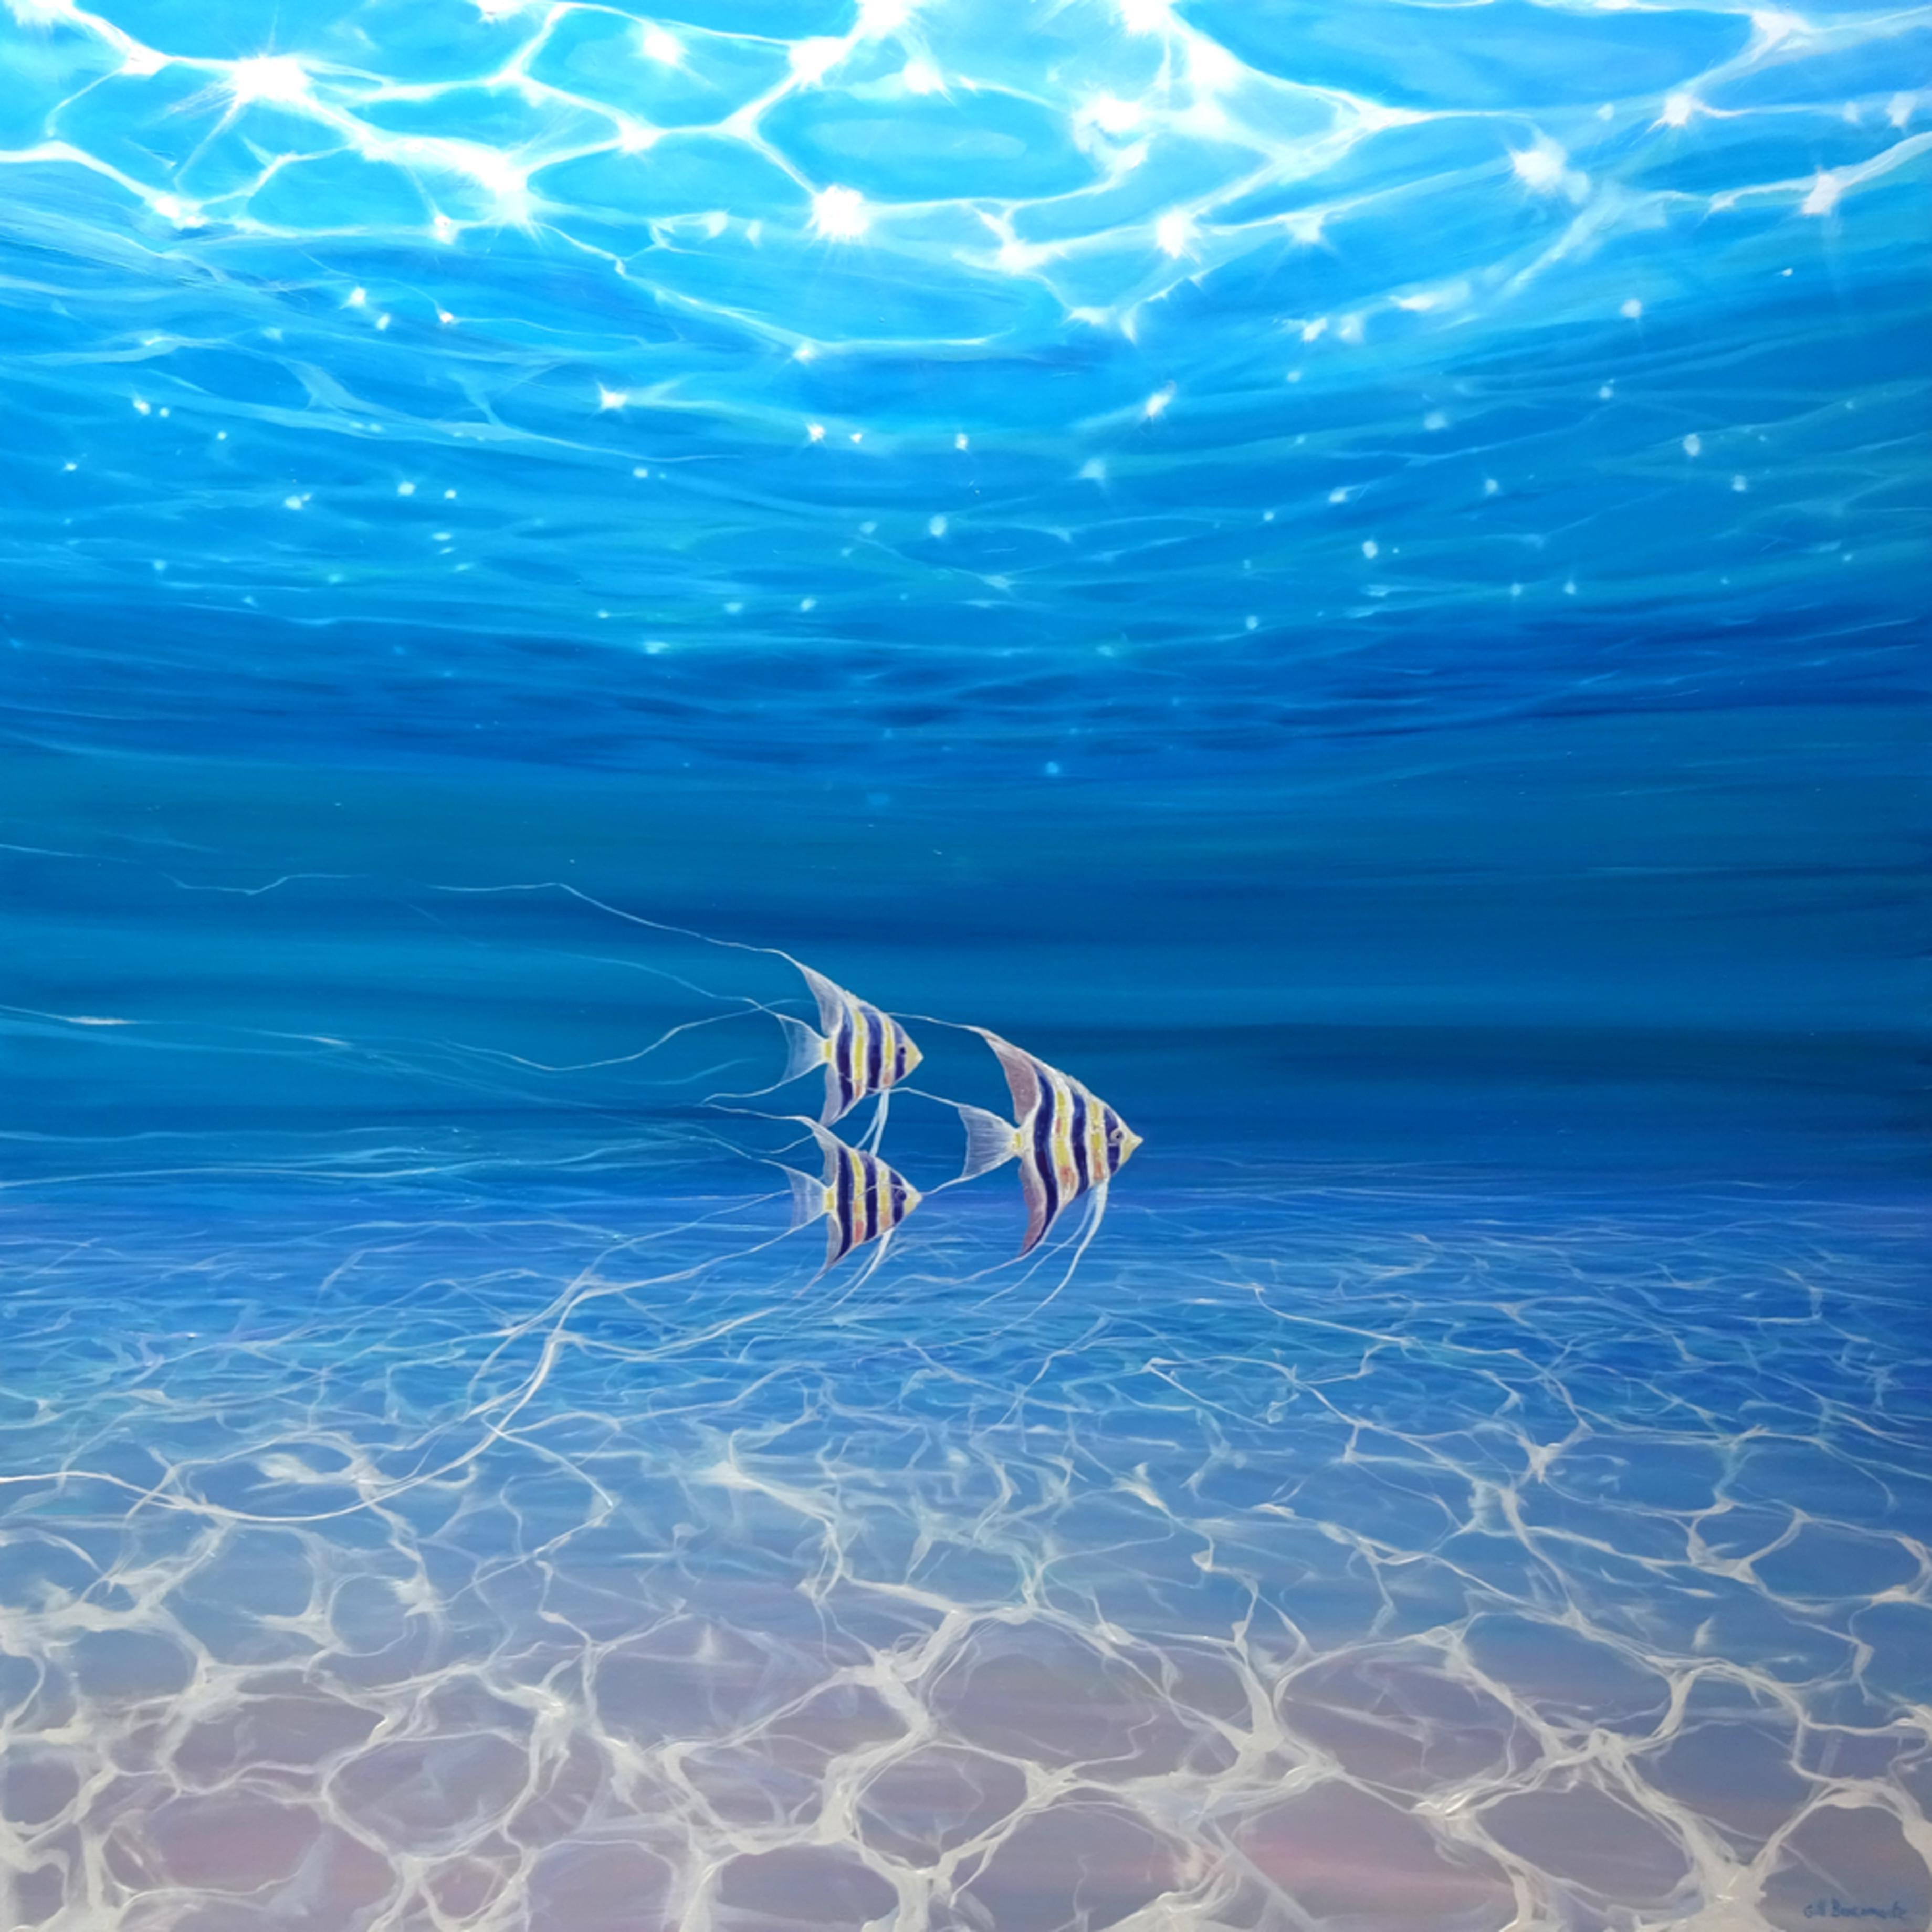 Under sea angels v9n58y